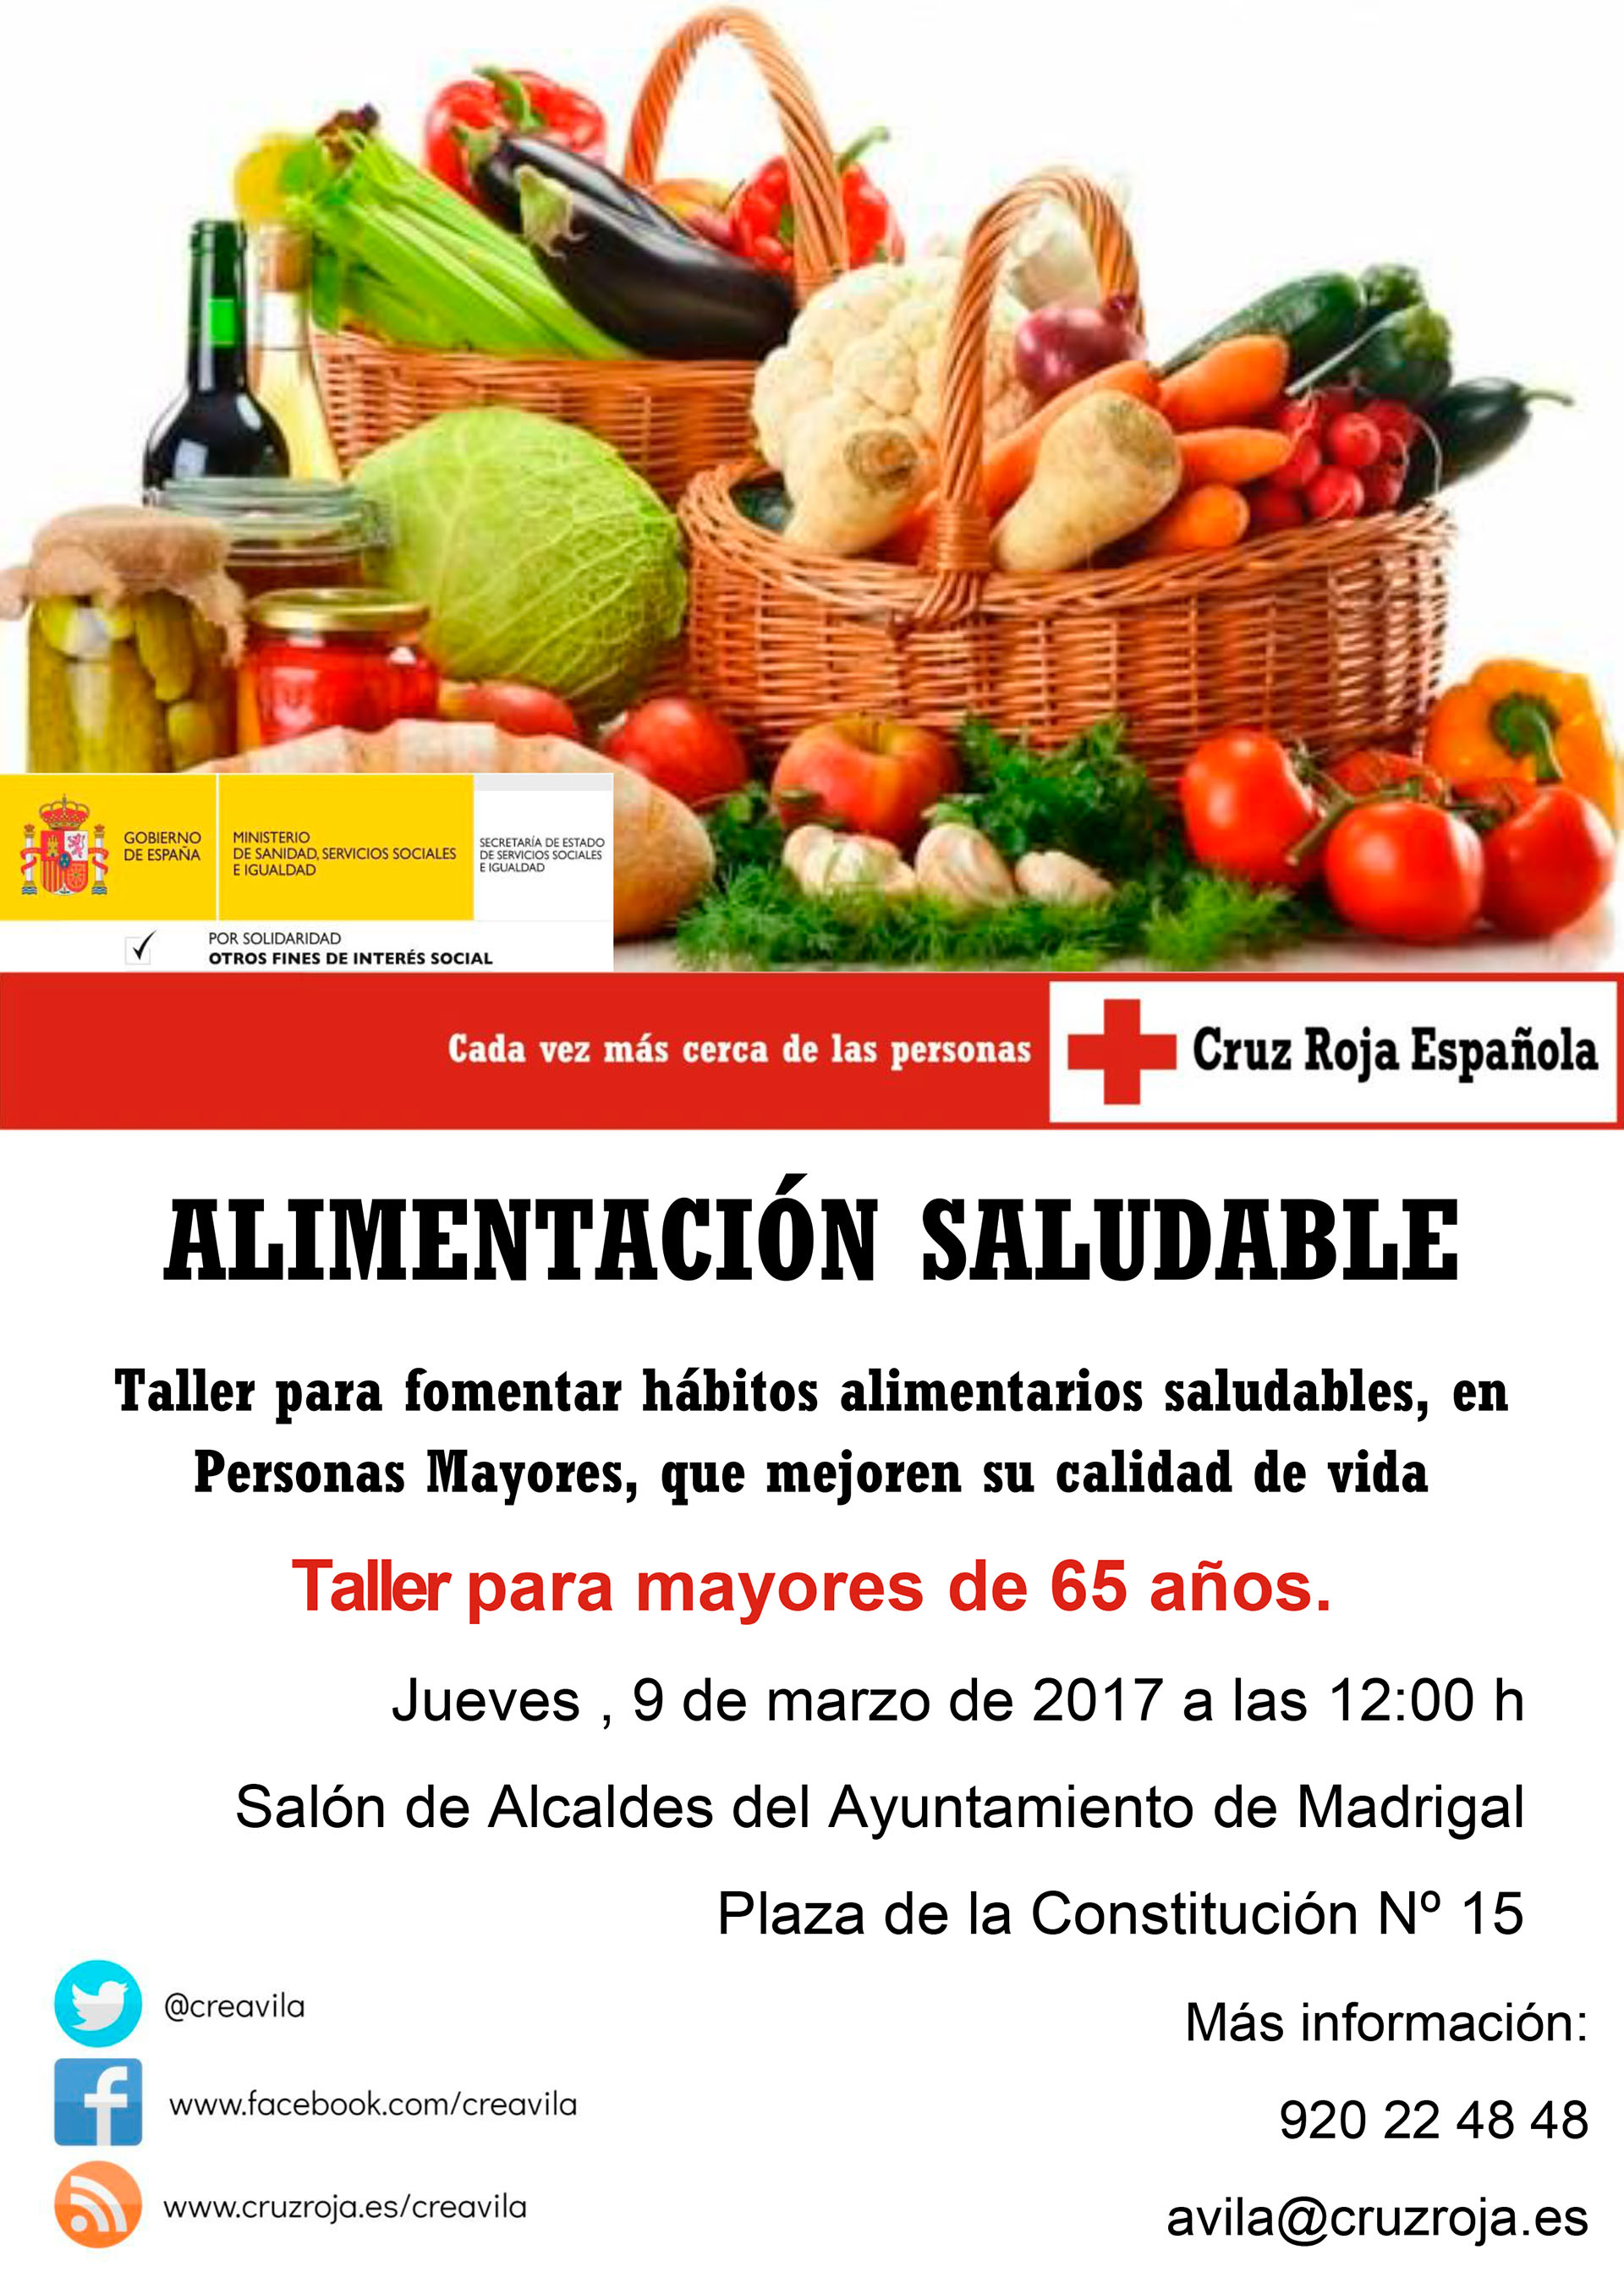 cartel_alimentacion_saludable_madrigal